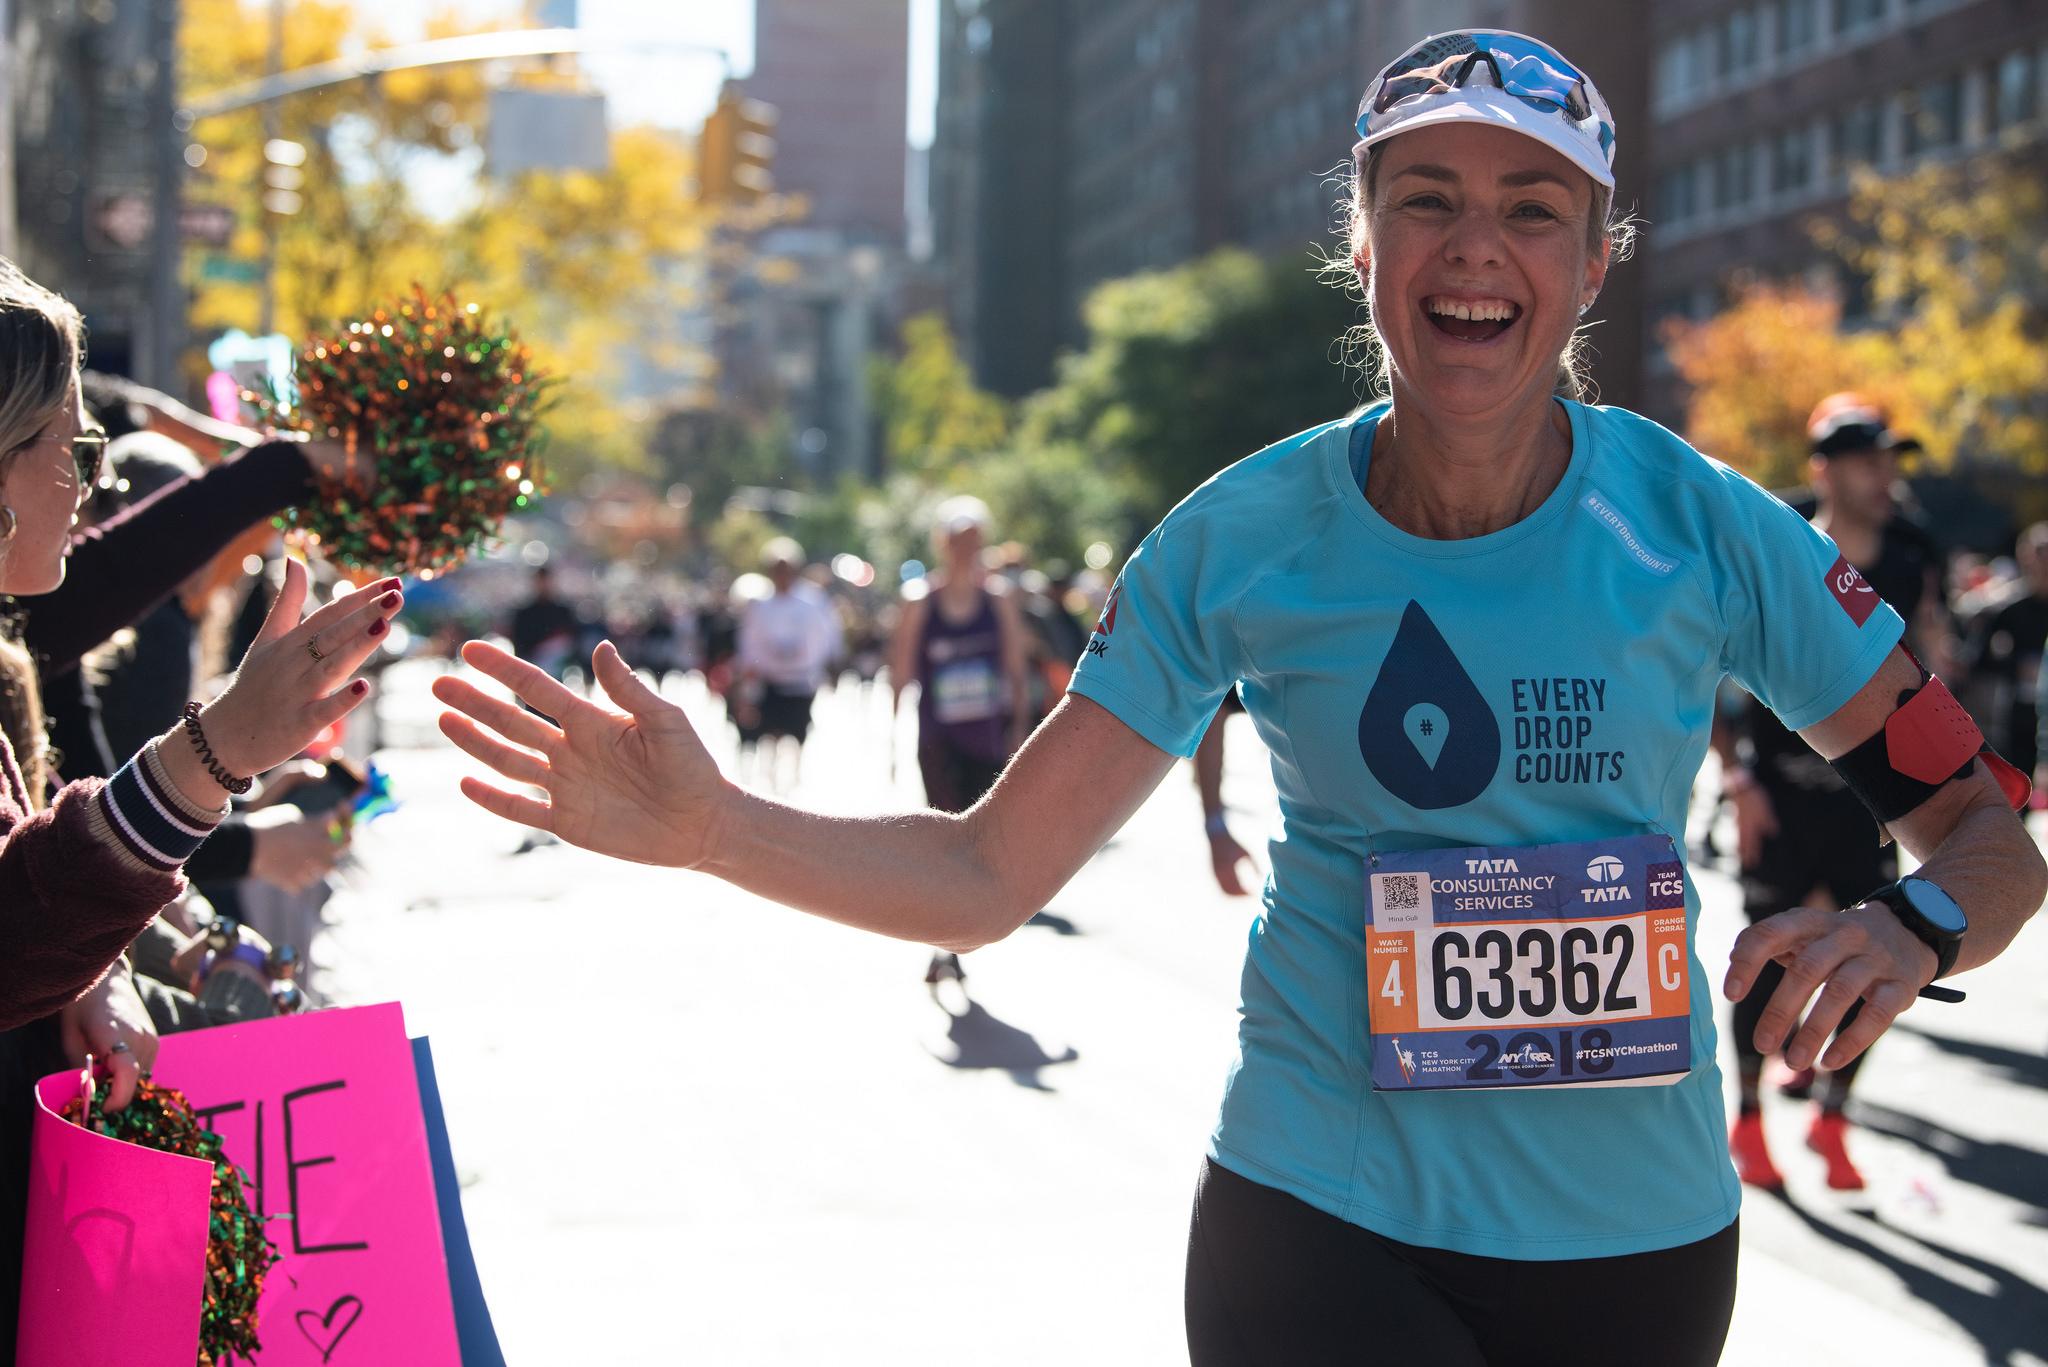 mina guly 100 marathons runningdry